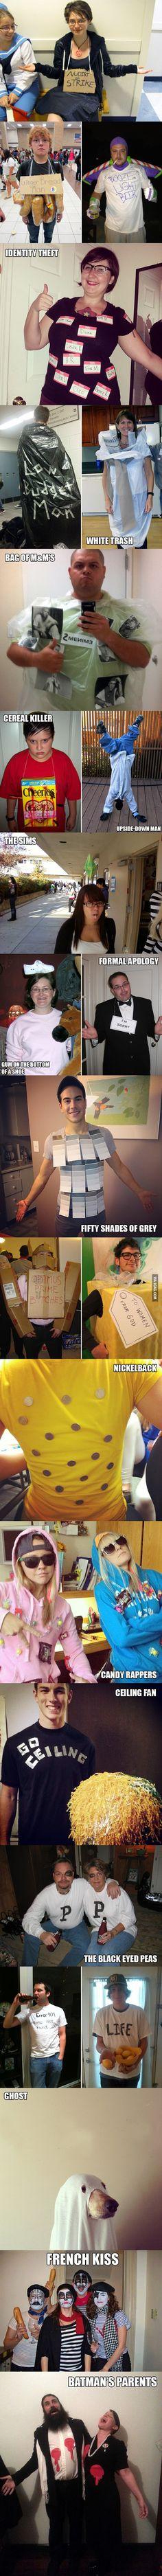 Last-minute Halloween costumes - 9GAG                                                                                                                                                                                 More